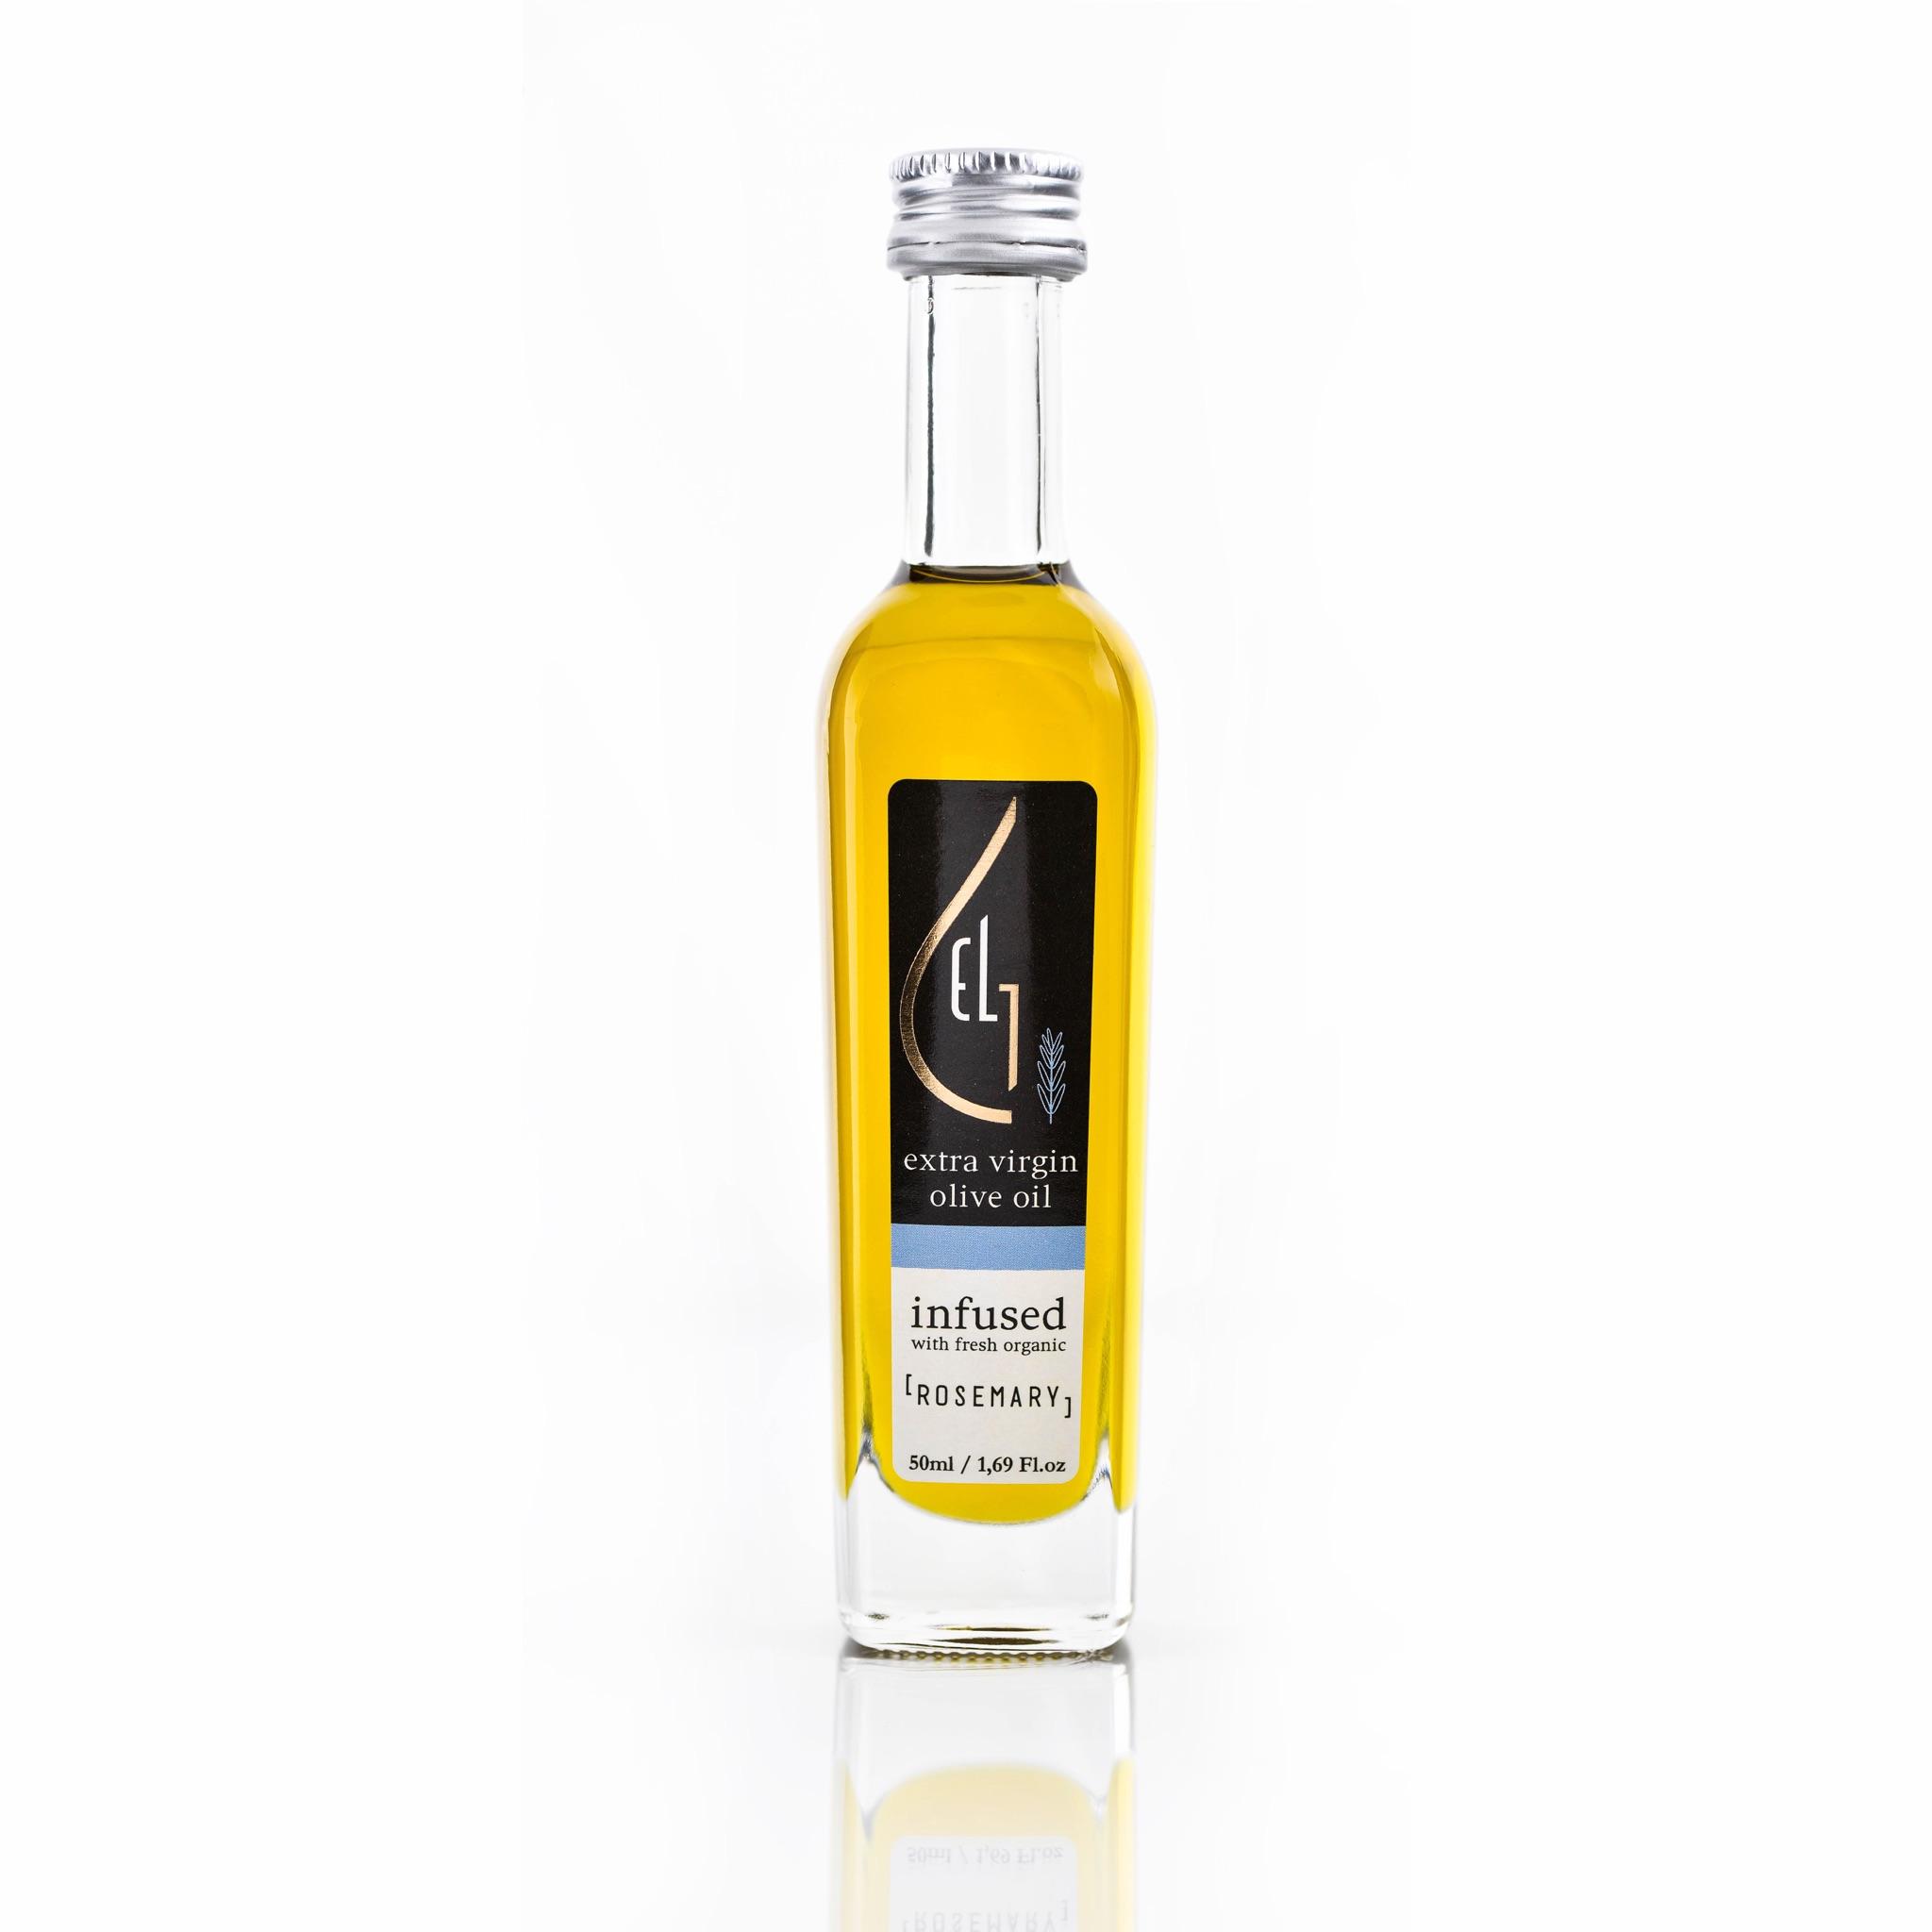 Pellas Nature Rosemary infused Olive Oil 1.69 oz Bottle